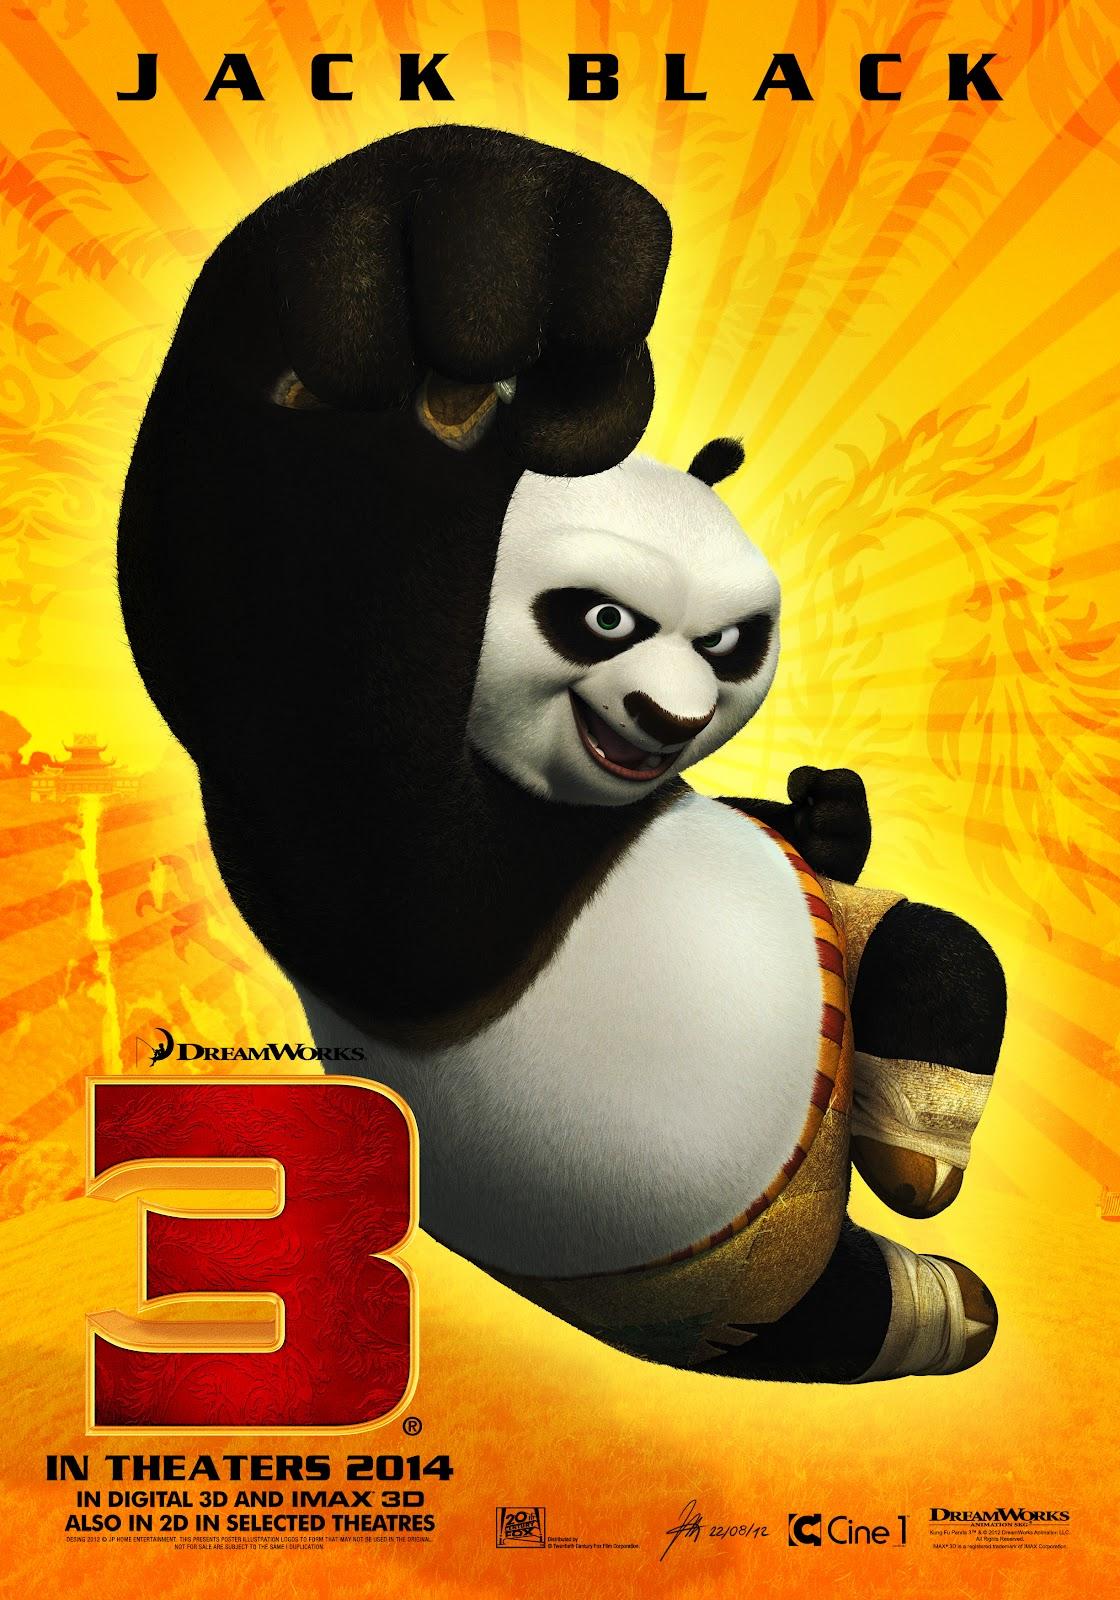 Kung Fu Panda 3 Future Movies 4 U